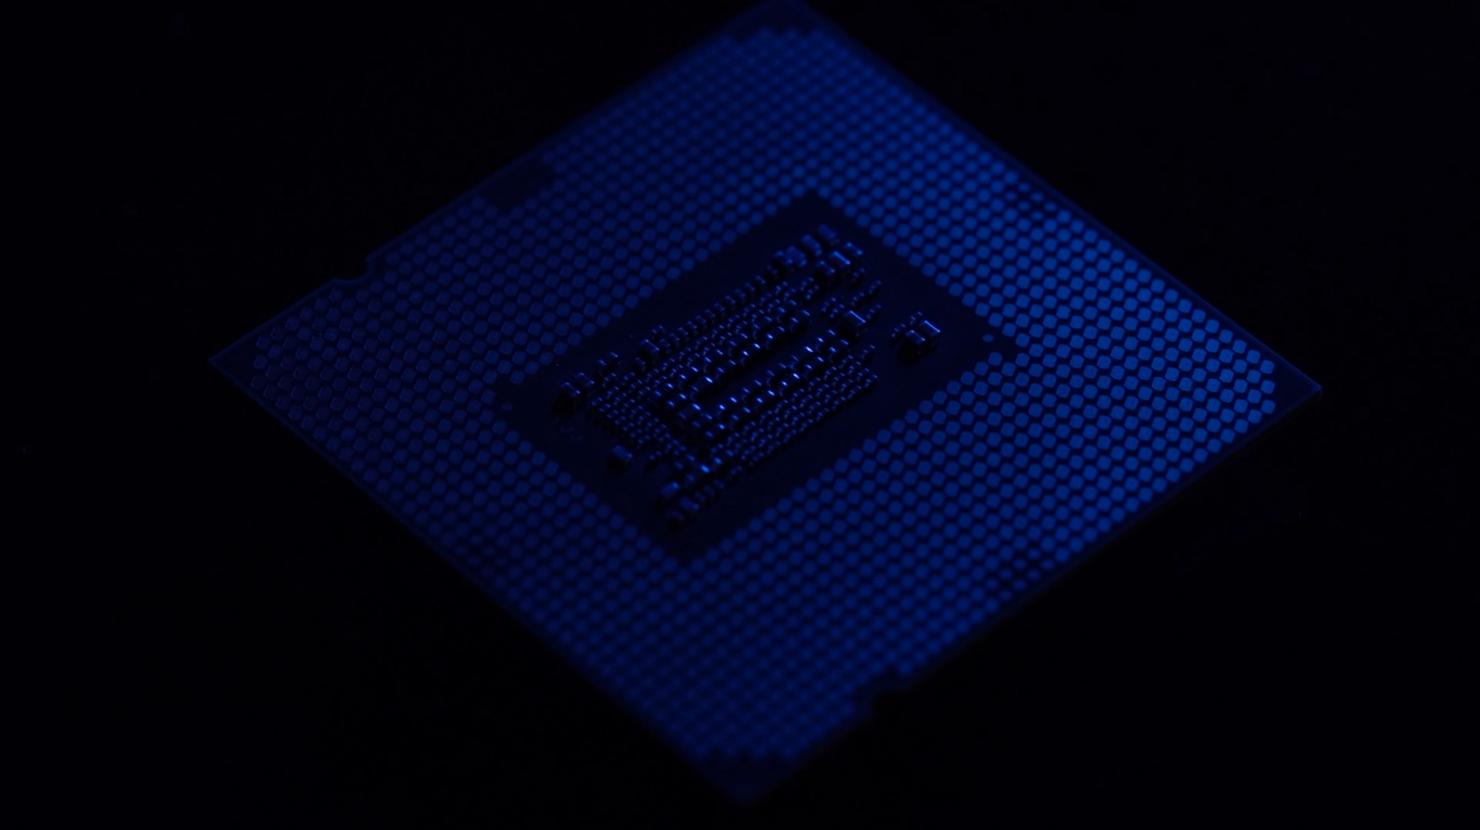 intel-core-i5-10400-comet-lake-s-6-core-desktop-cpu_2